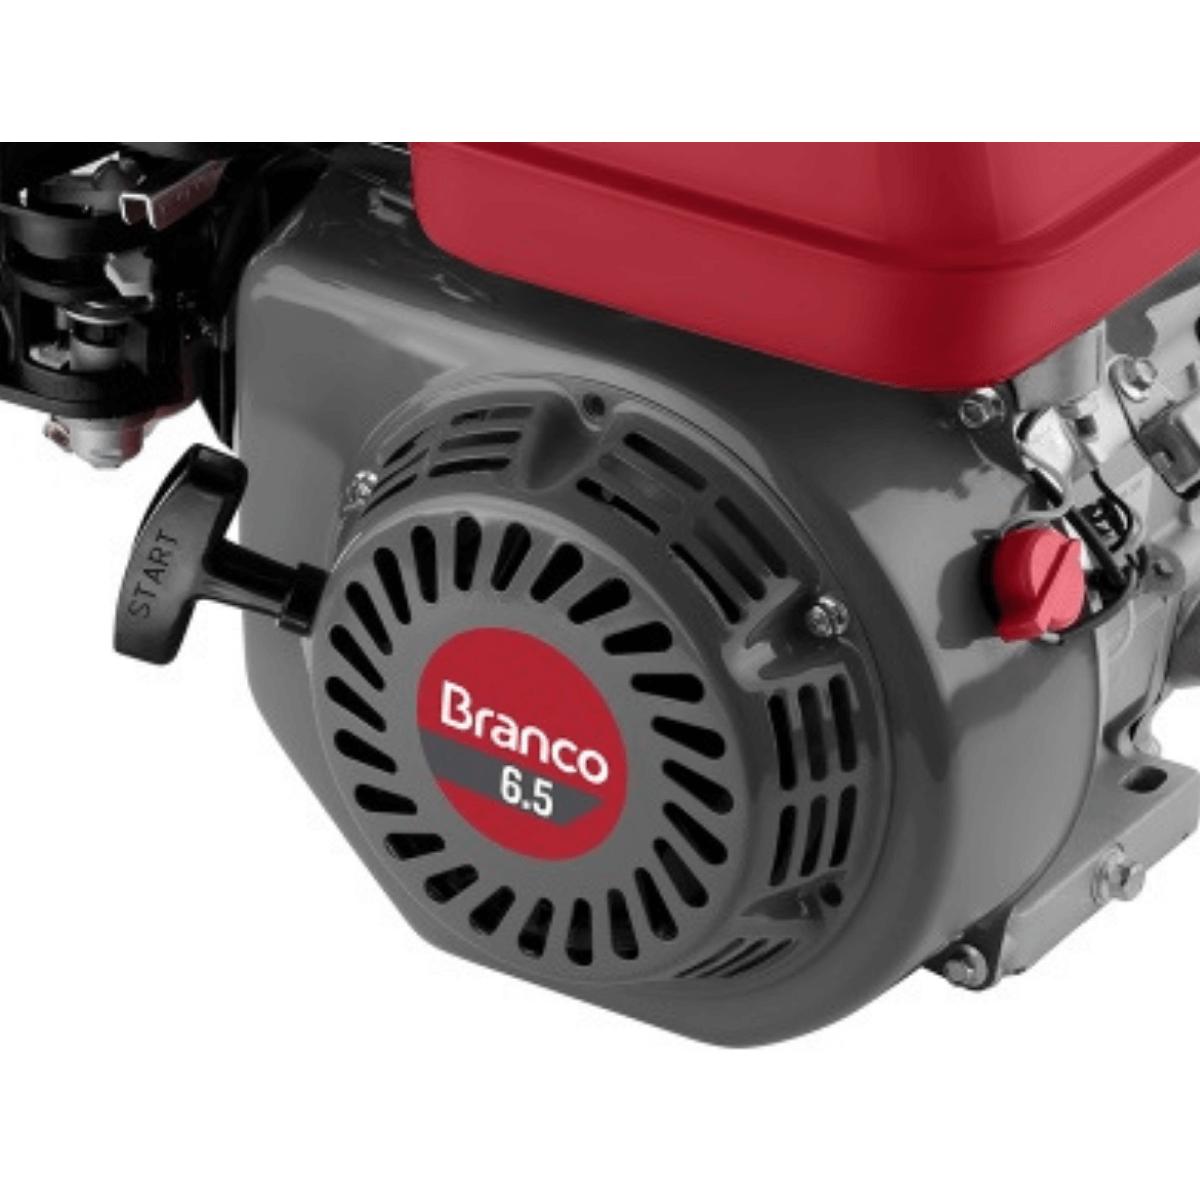 MOTOR 6,5HP B4T A GASOLINA BRANCO - 90500342